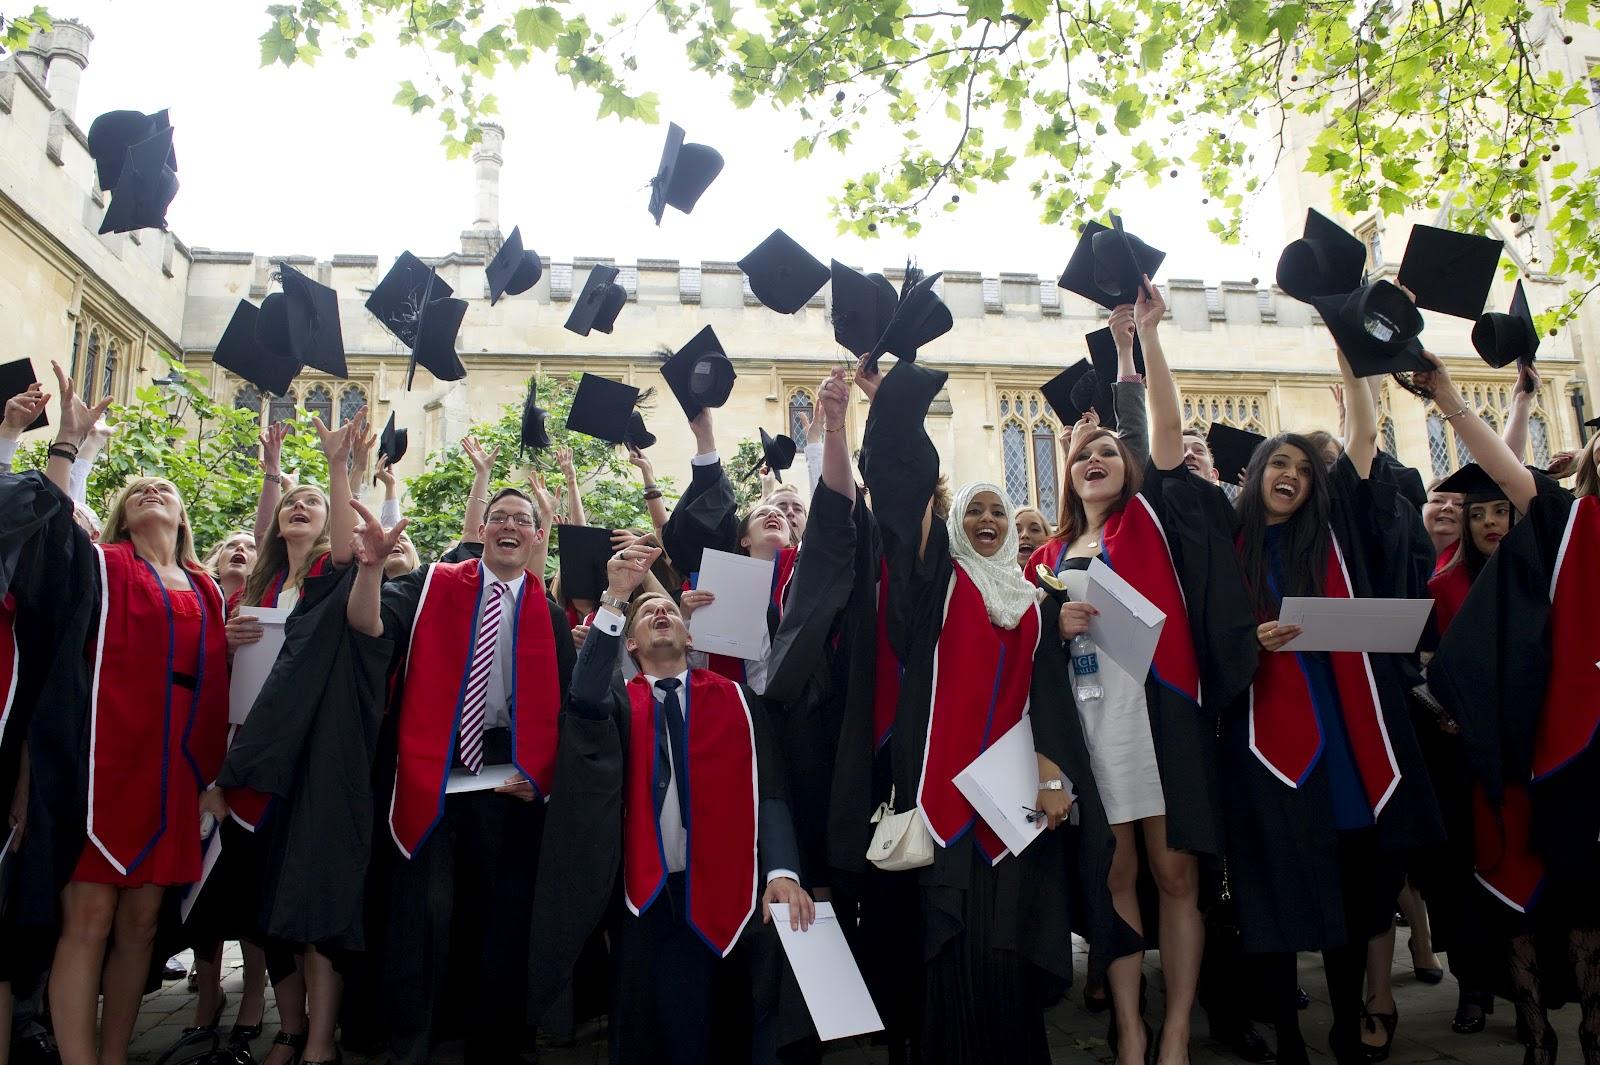 Bedfordshire-University-yurtdisinda-lisans-ingiltere-5.jpg